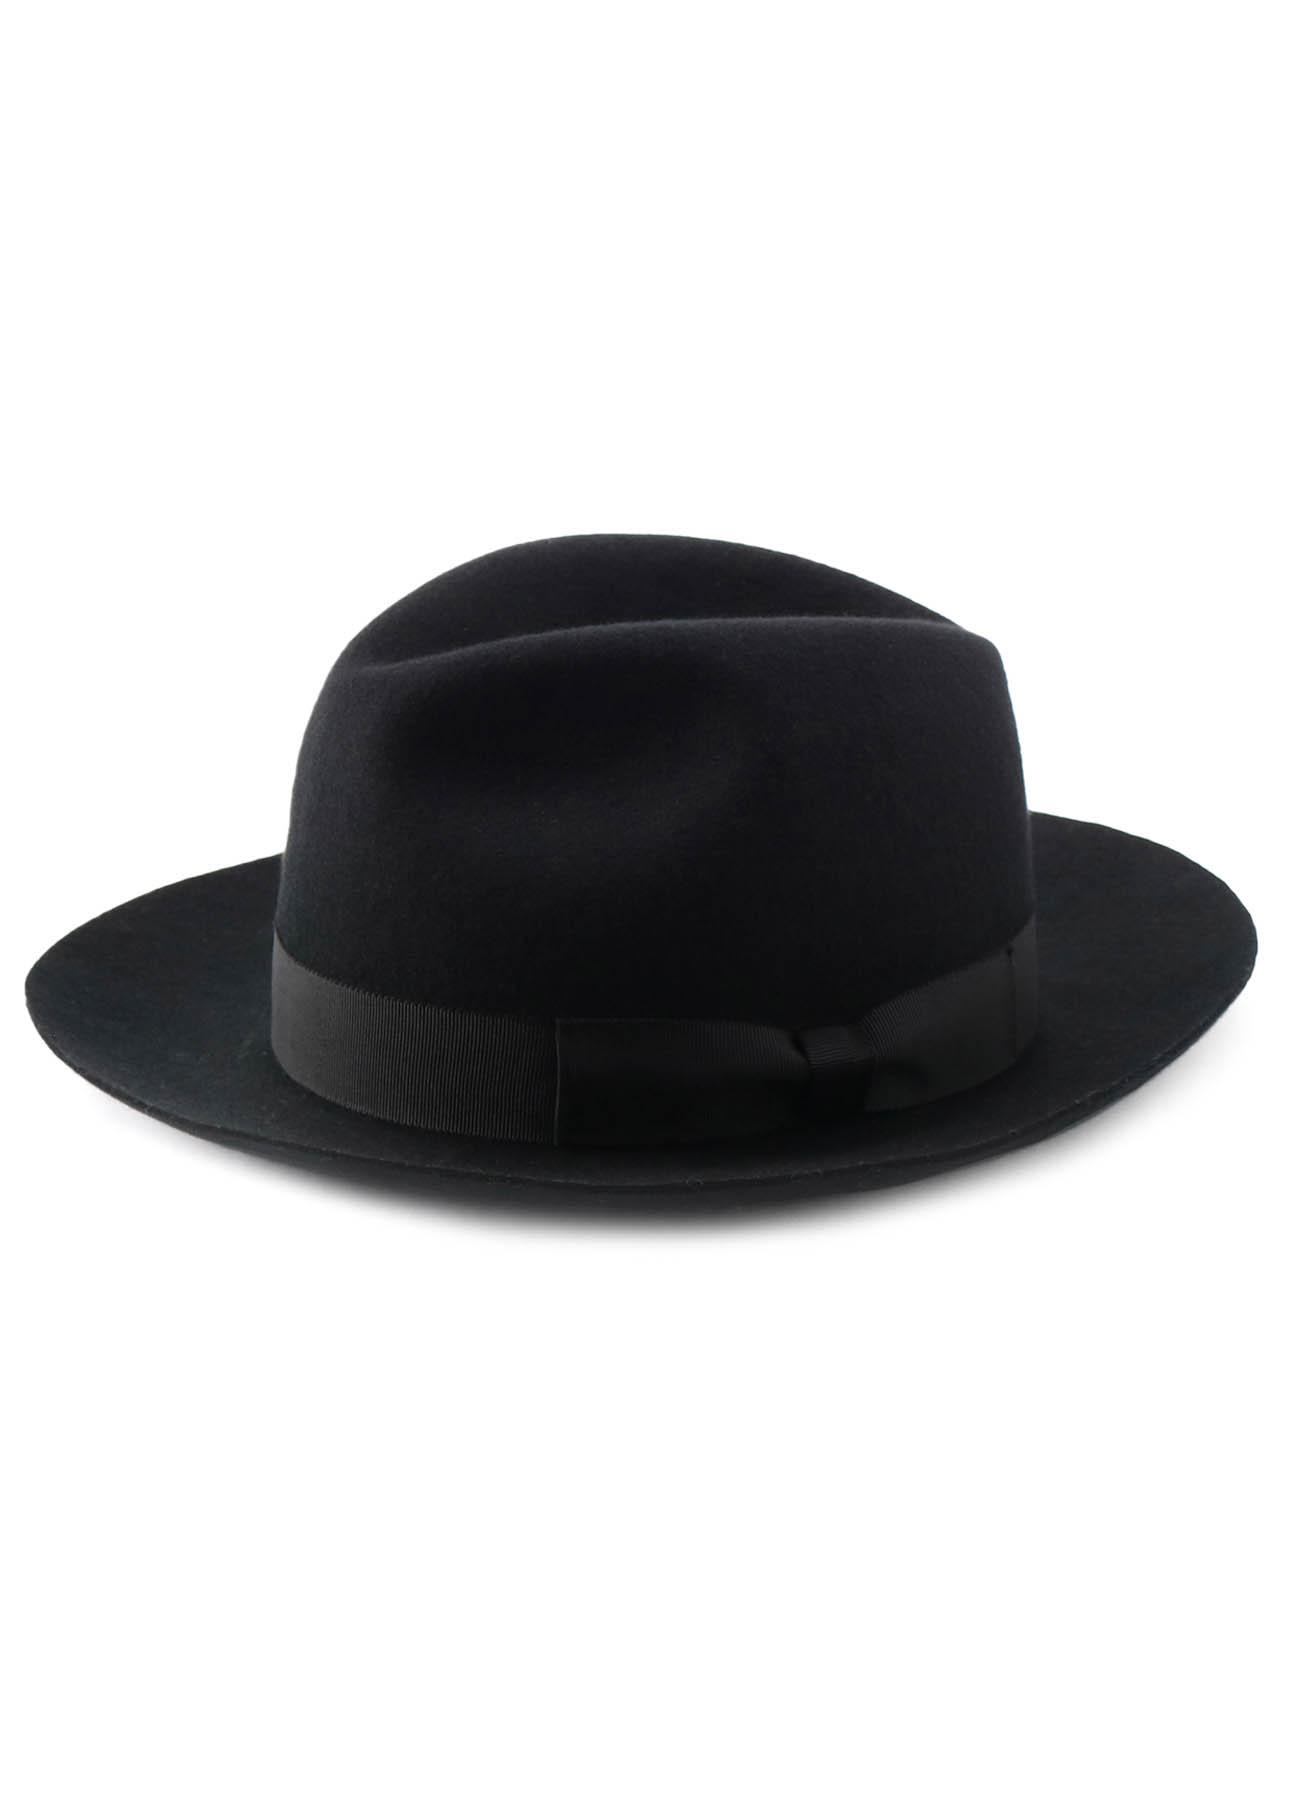 WOOL FELT HAT BODY A SOFT HAT